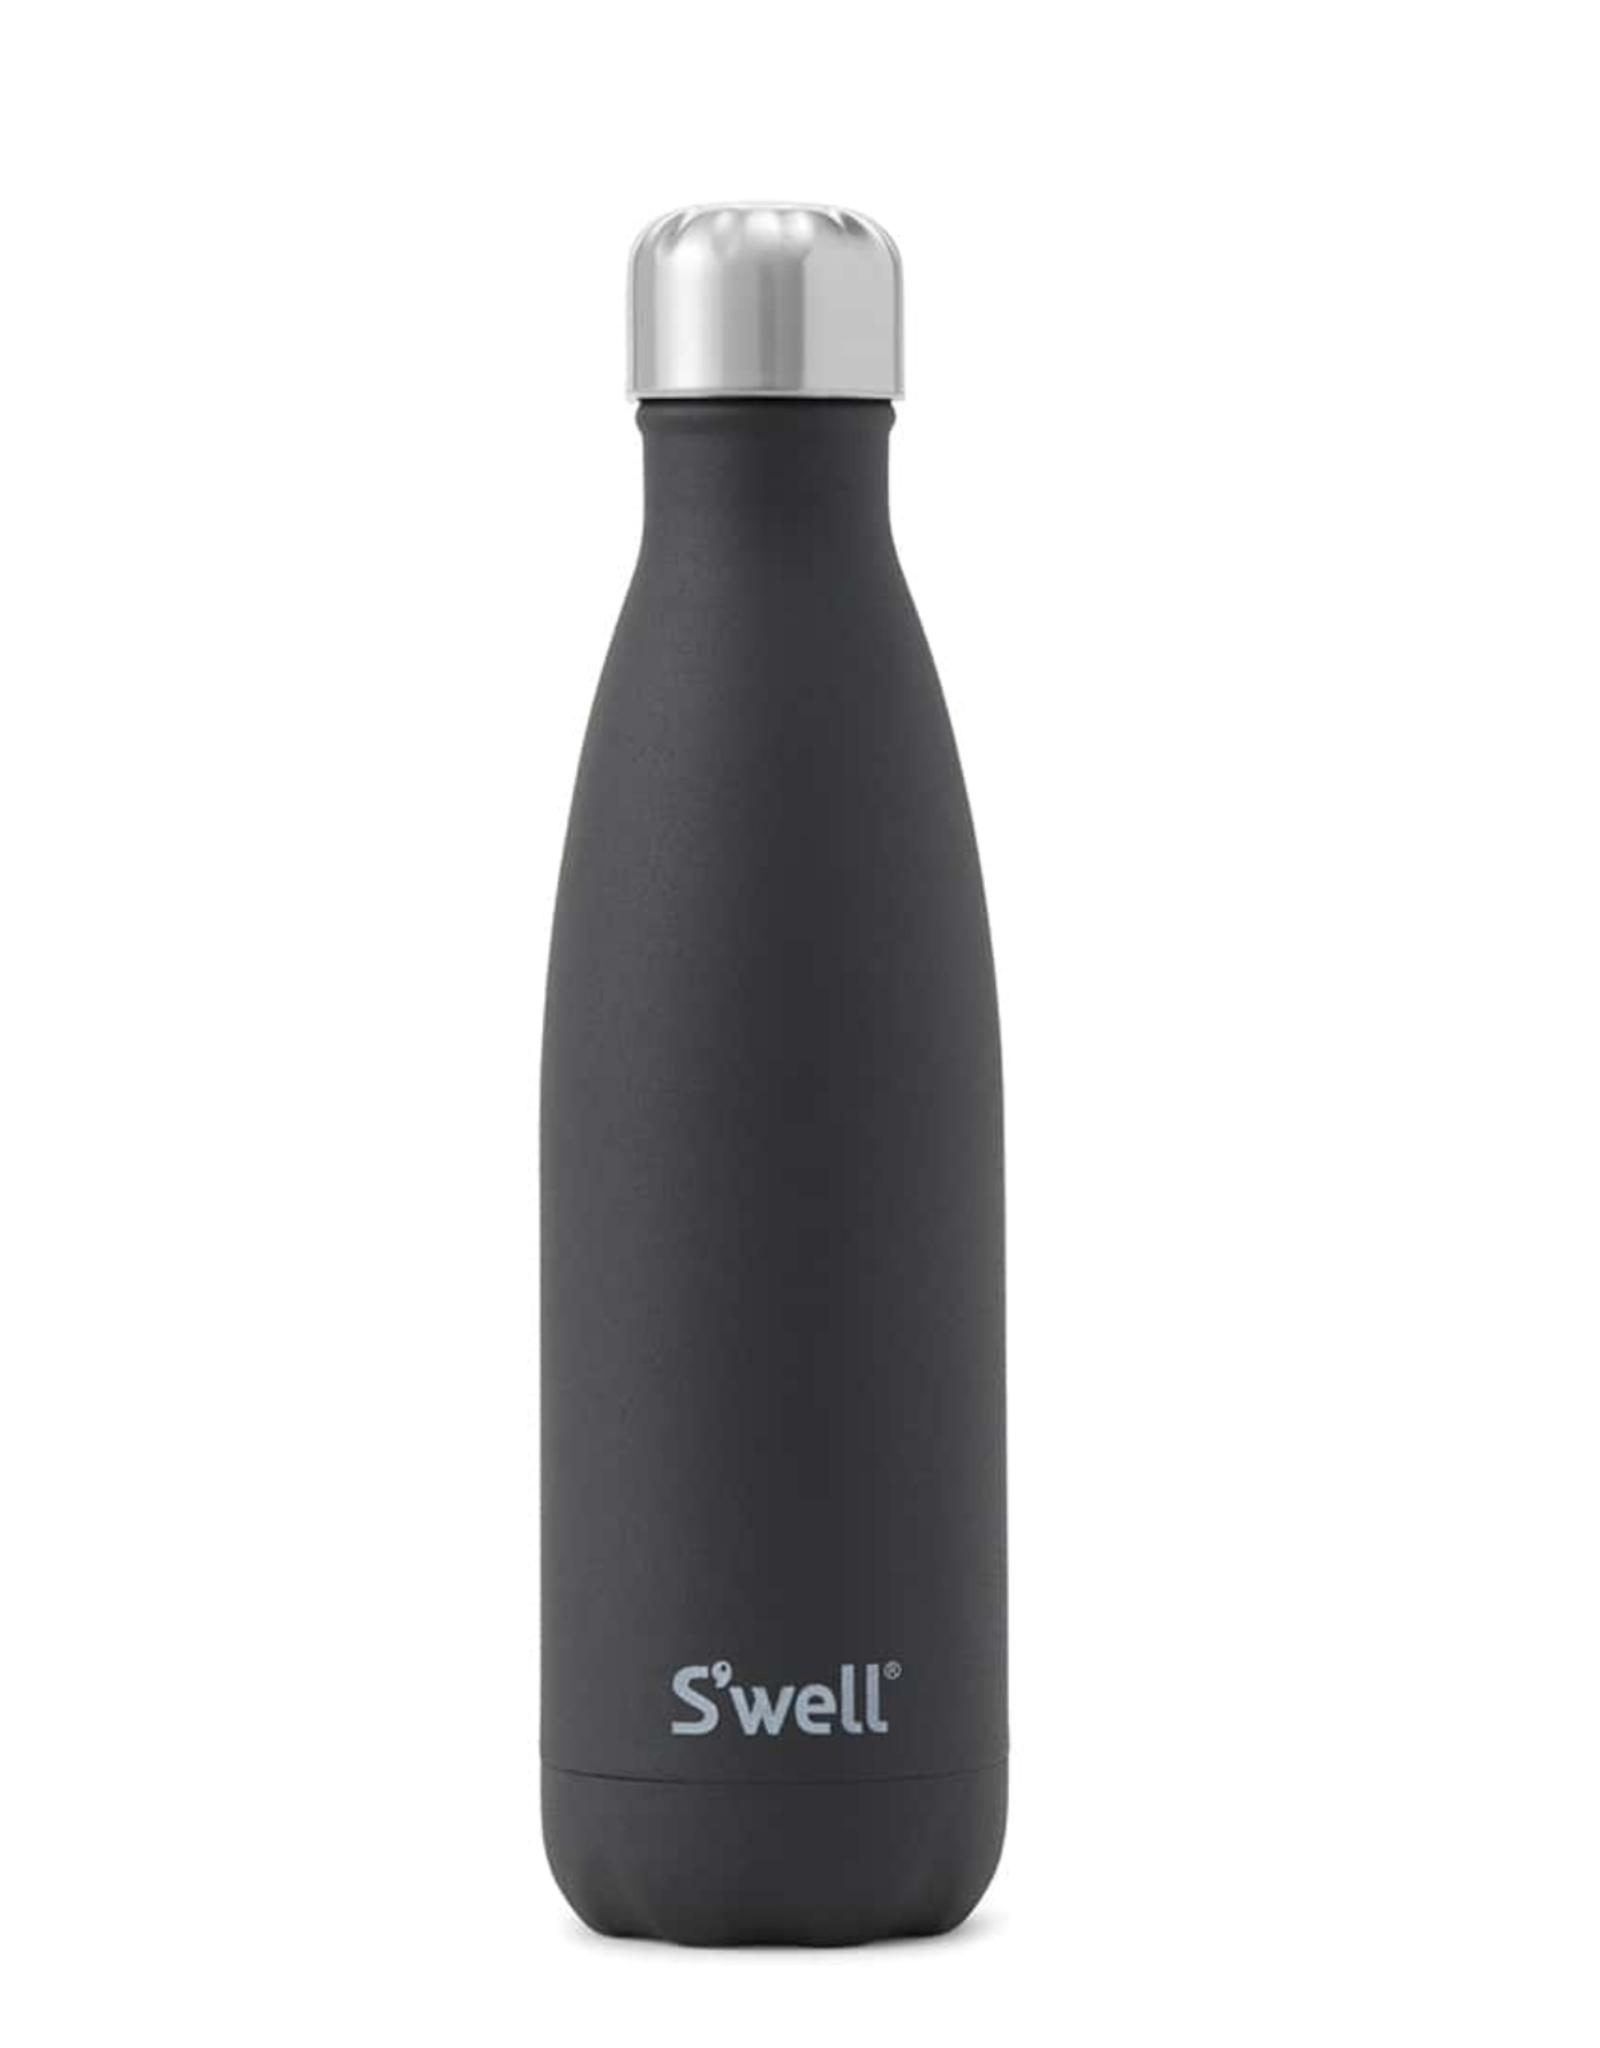 S'well S'well - 17oz Bottle - Onyx